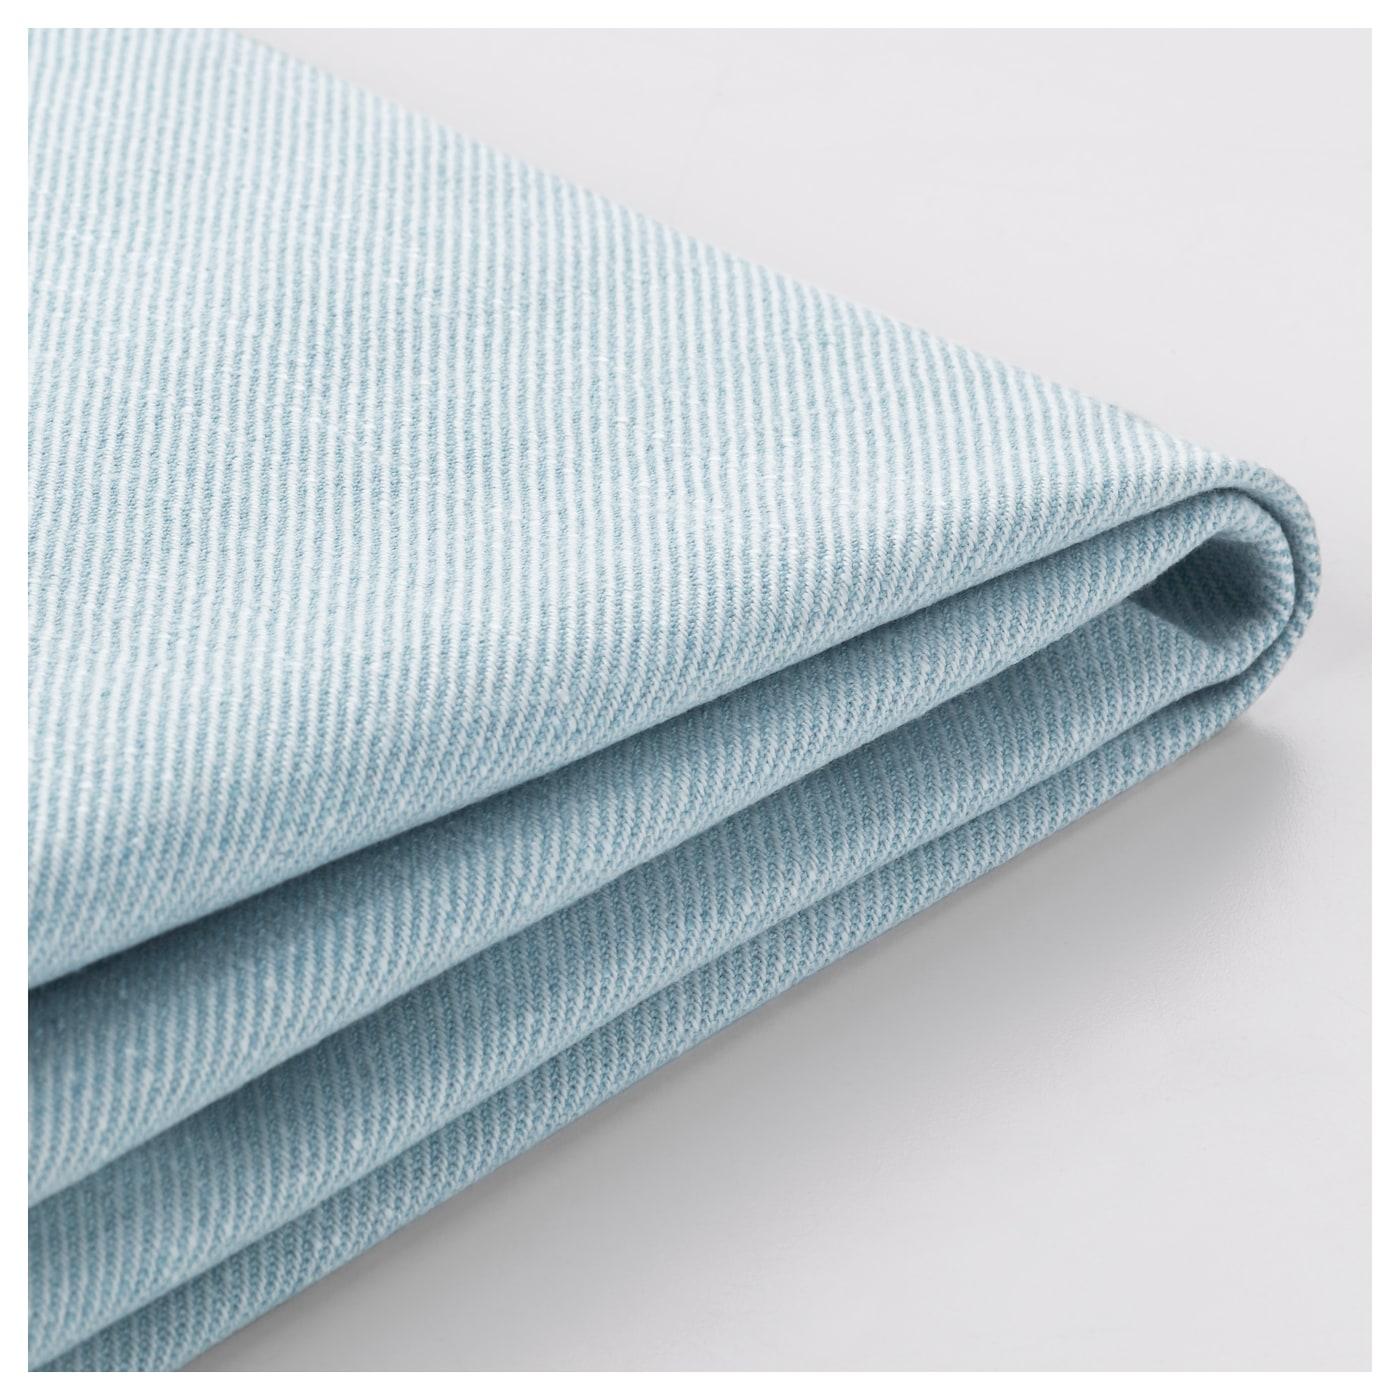 Jennylund armchair cover nordvalla light blue ikea for Light blue armchair